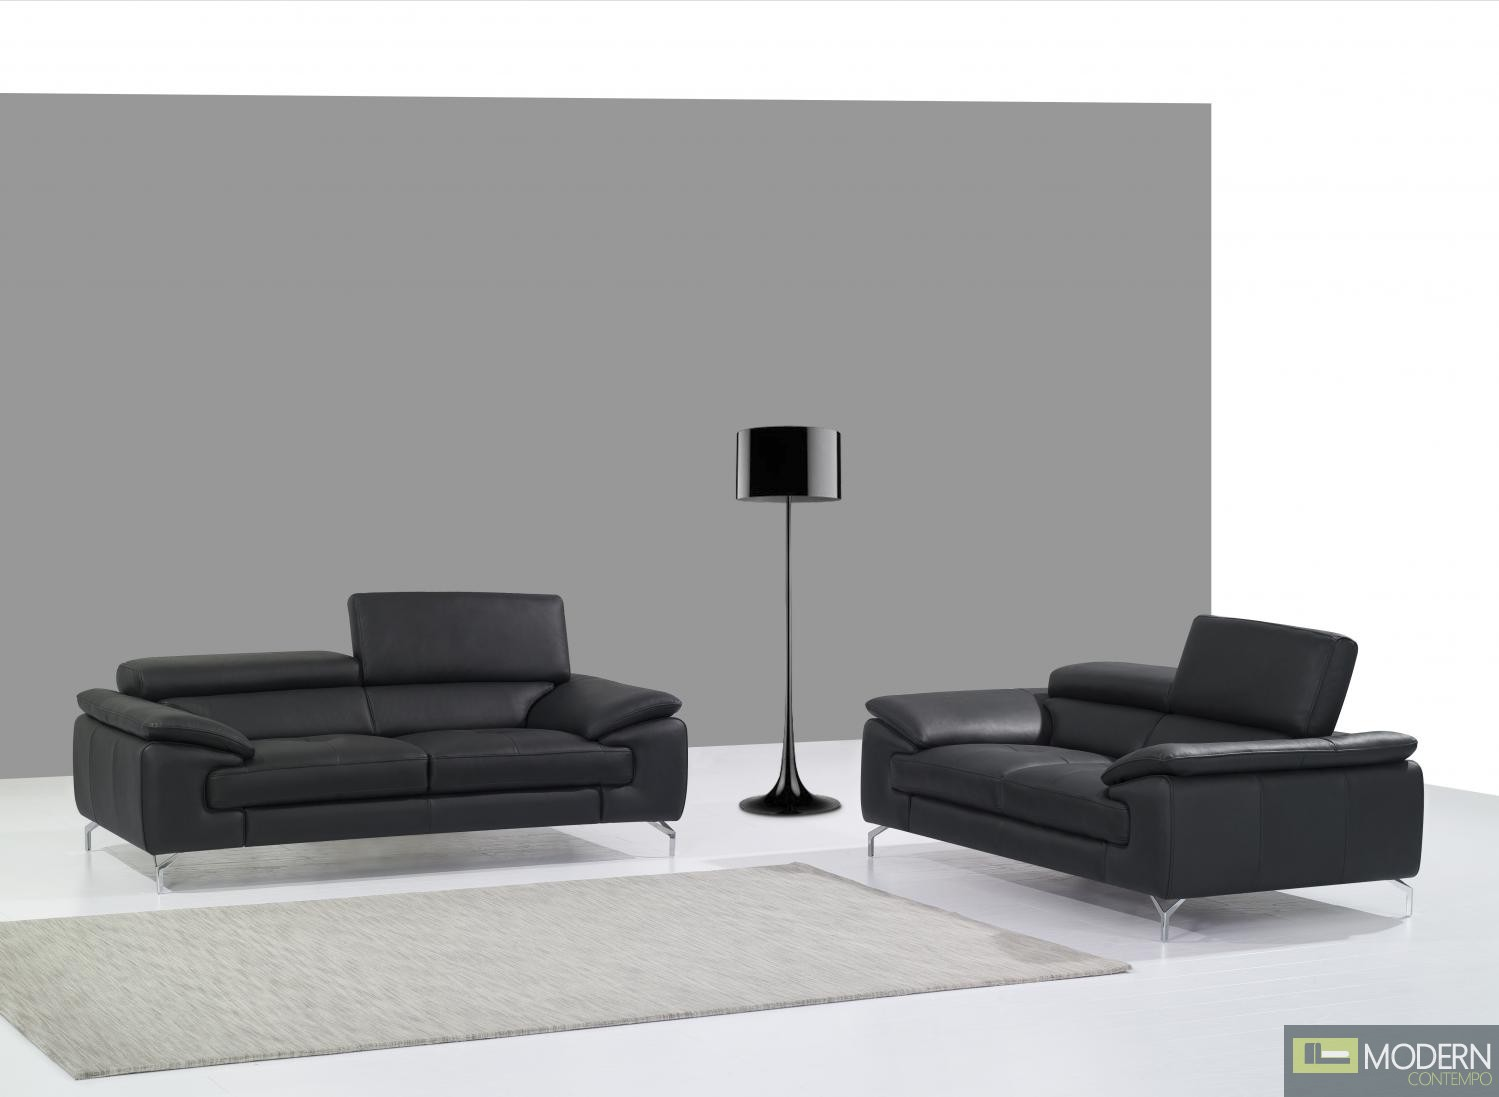 A973 Italian Leather Love in Black